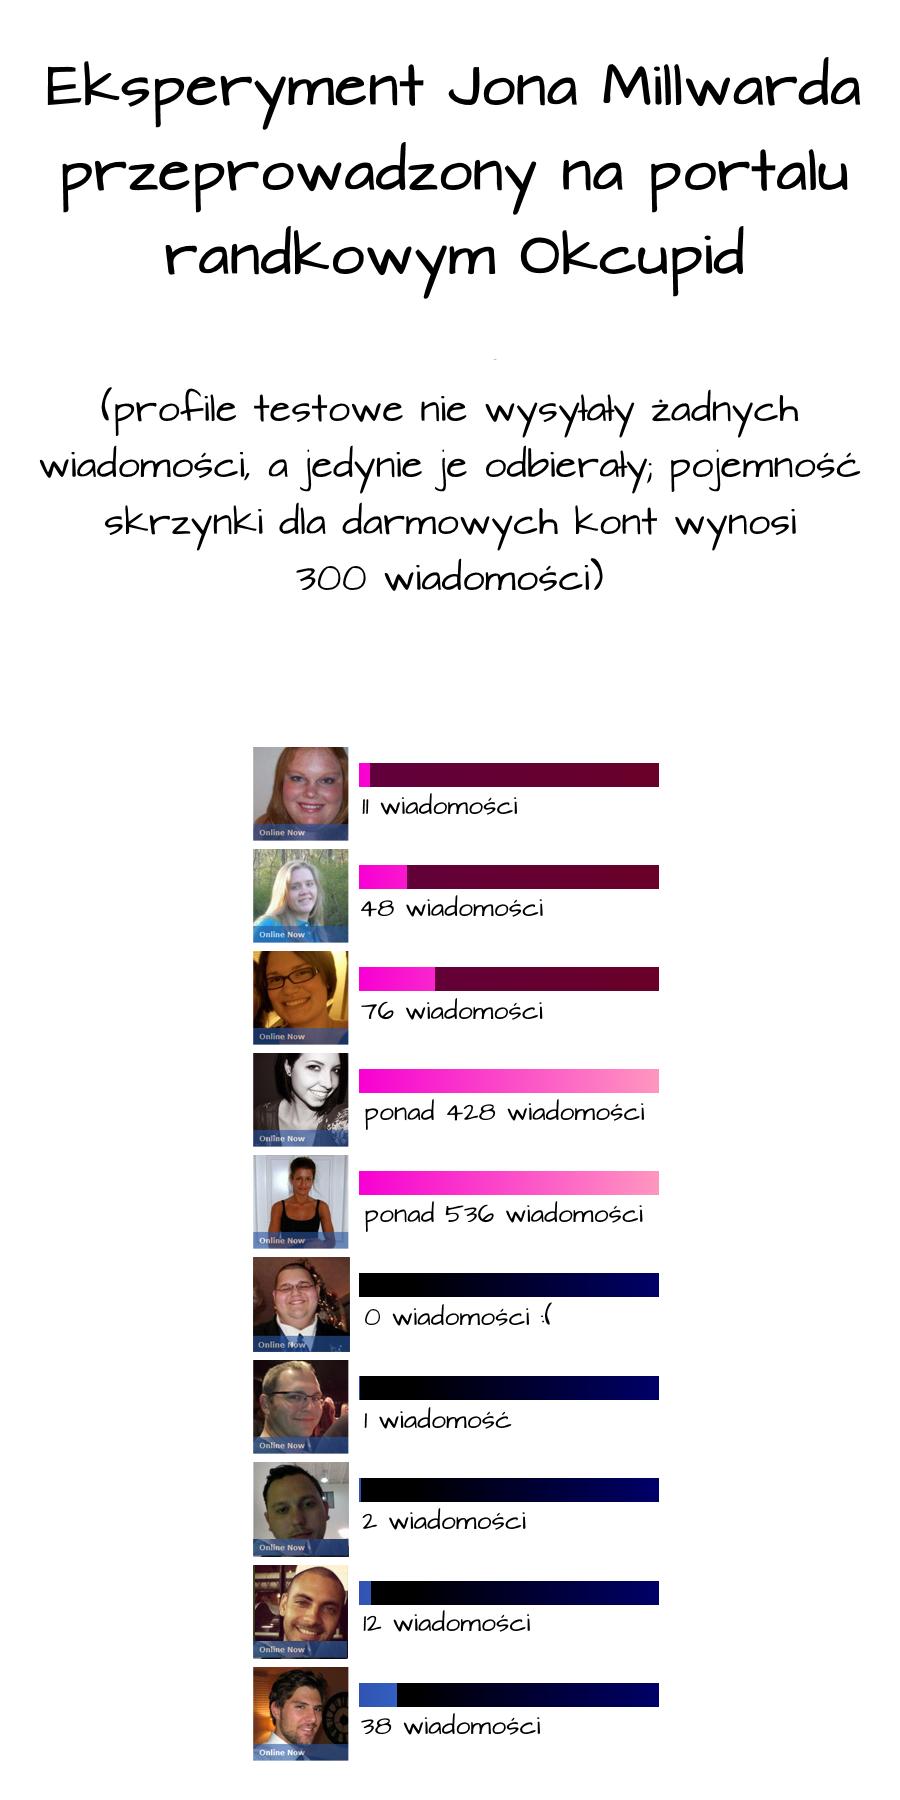 serwisy randkowe Yahoo Messenger